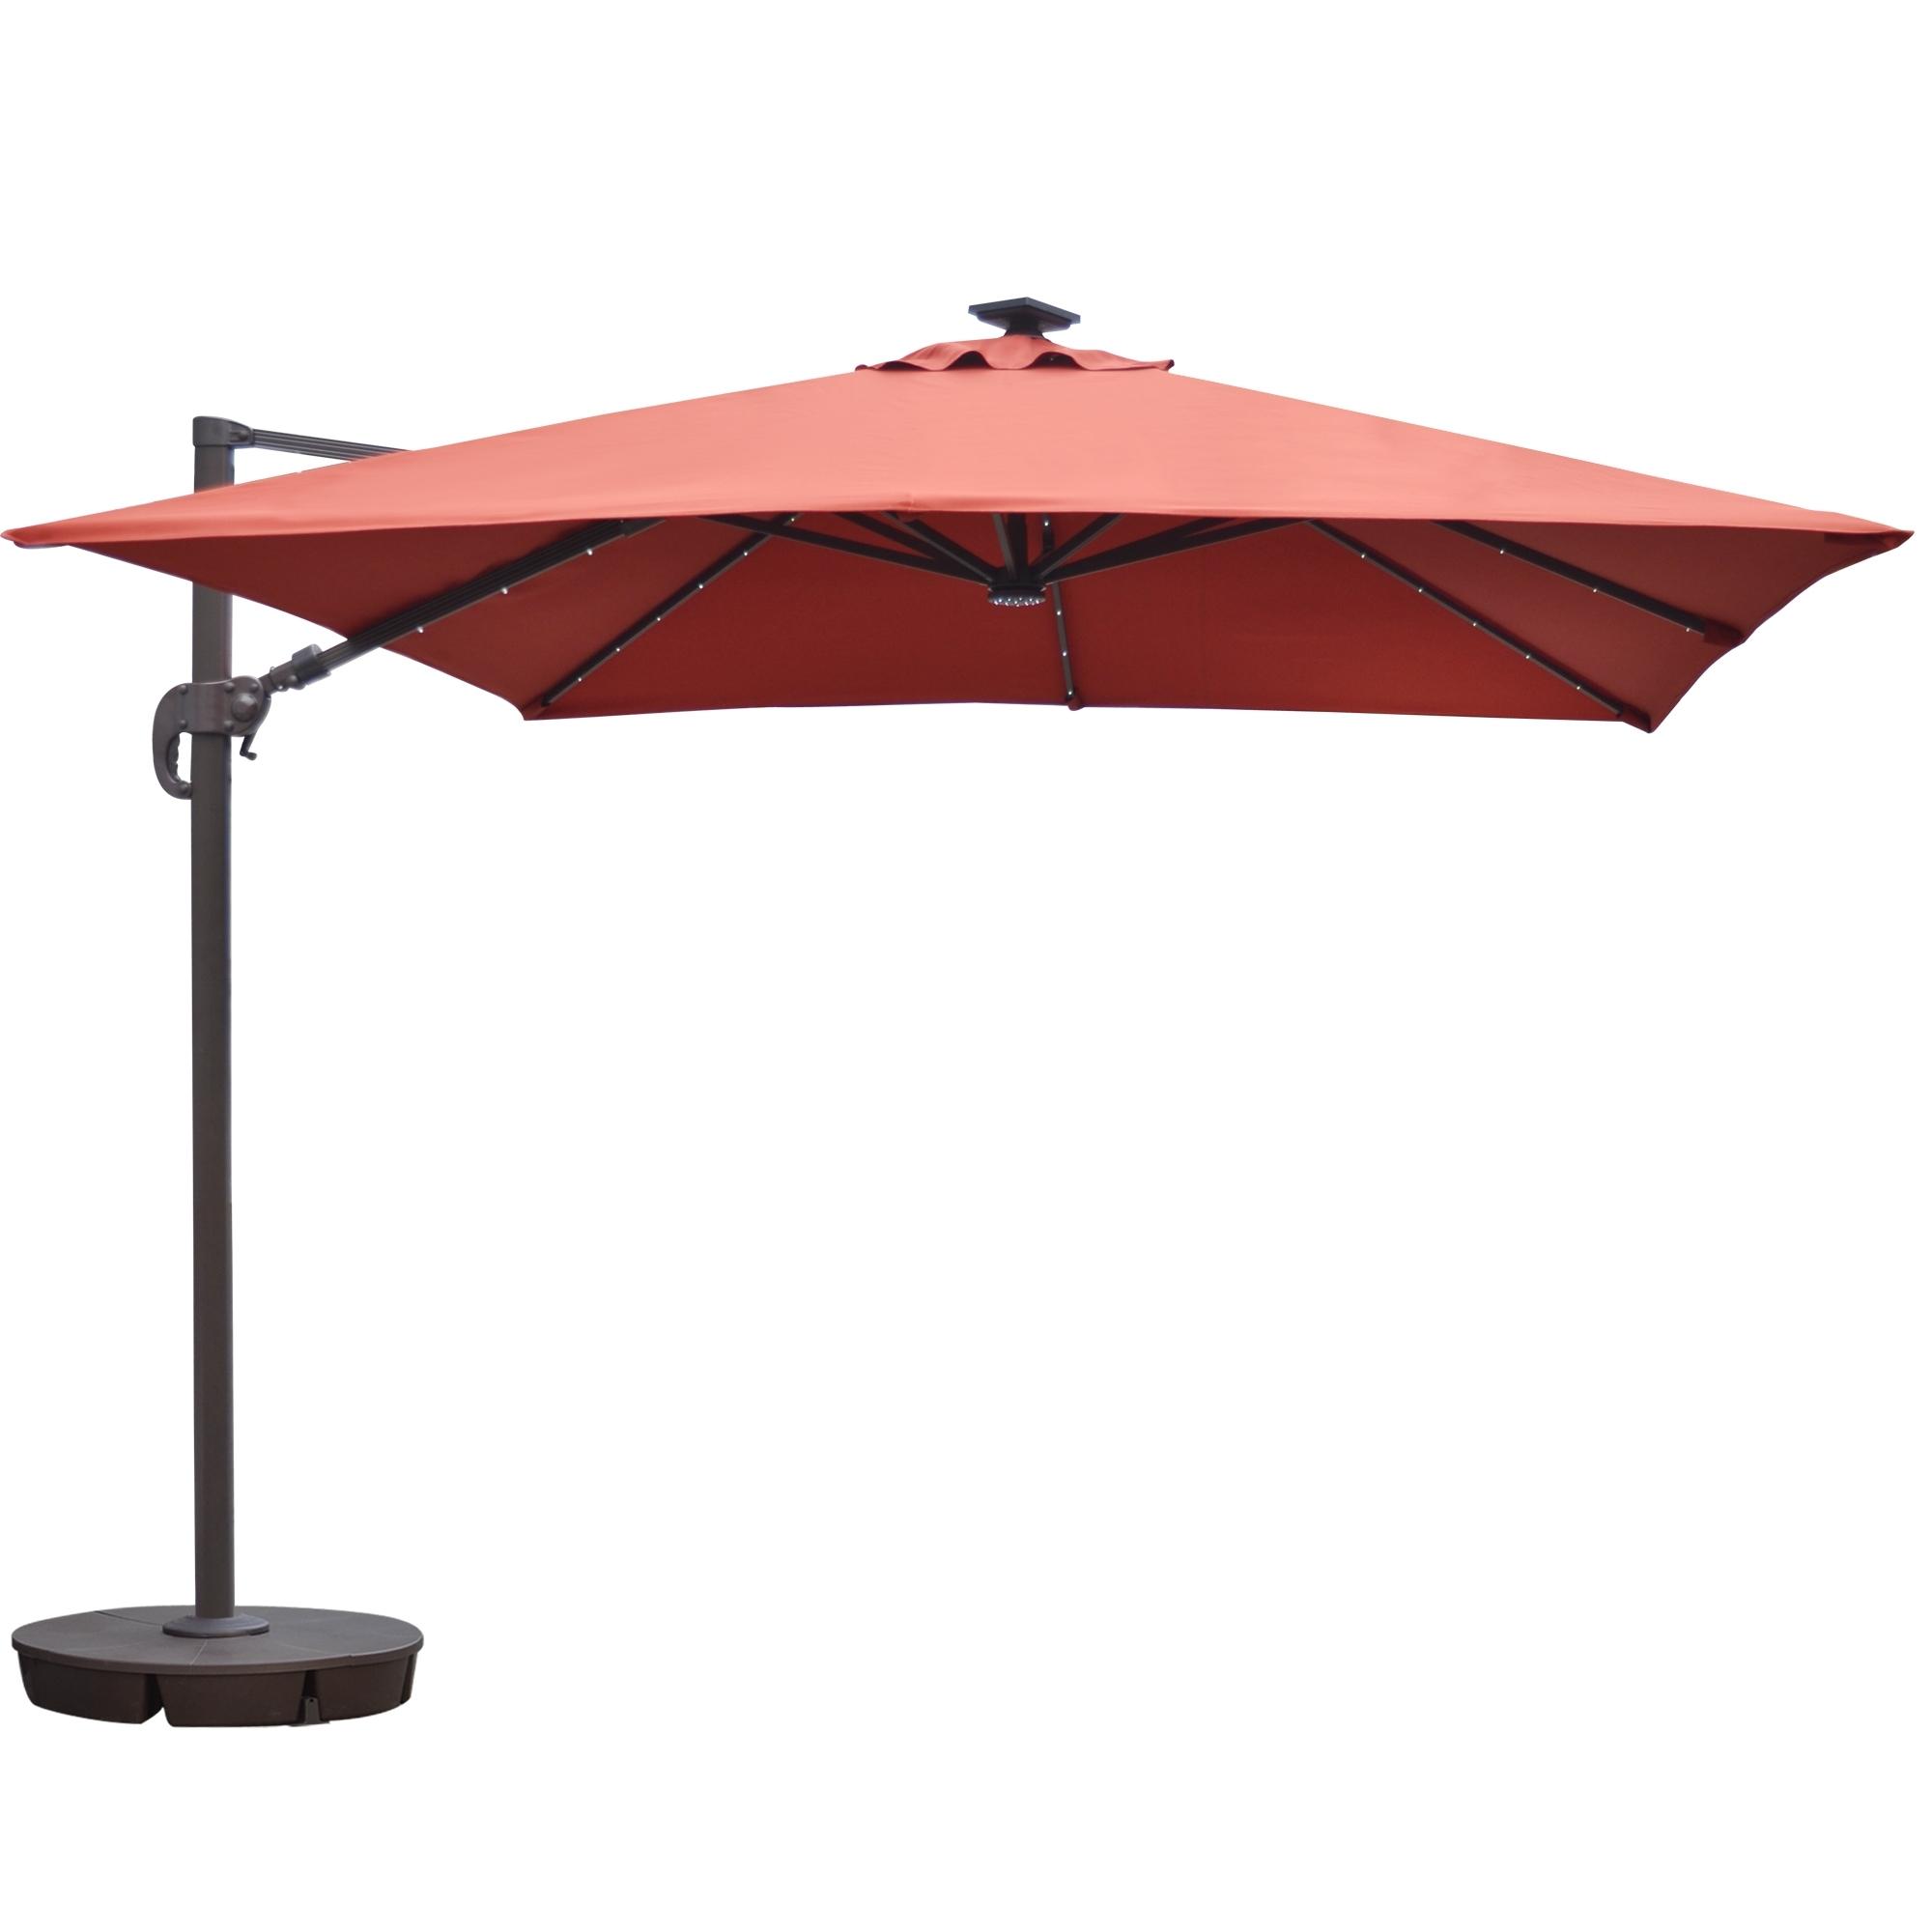 Widely Used Island Umbrella Santorini Ii Fiesta 10 Ft Square Cantilever Solar Regarding Cantilever Patio Umbrellas (View 15 of 20)